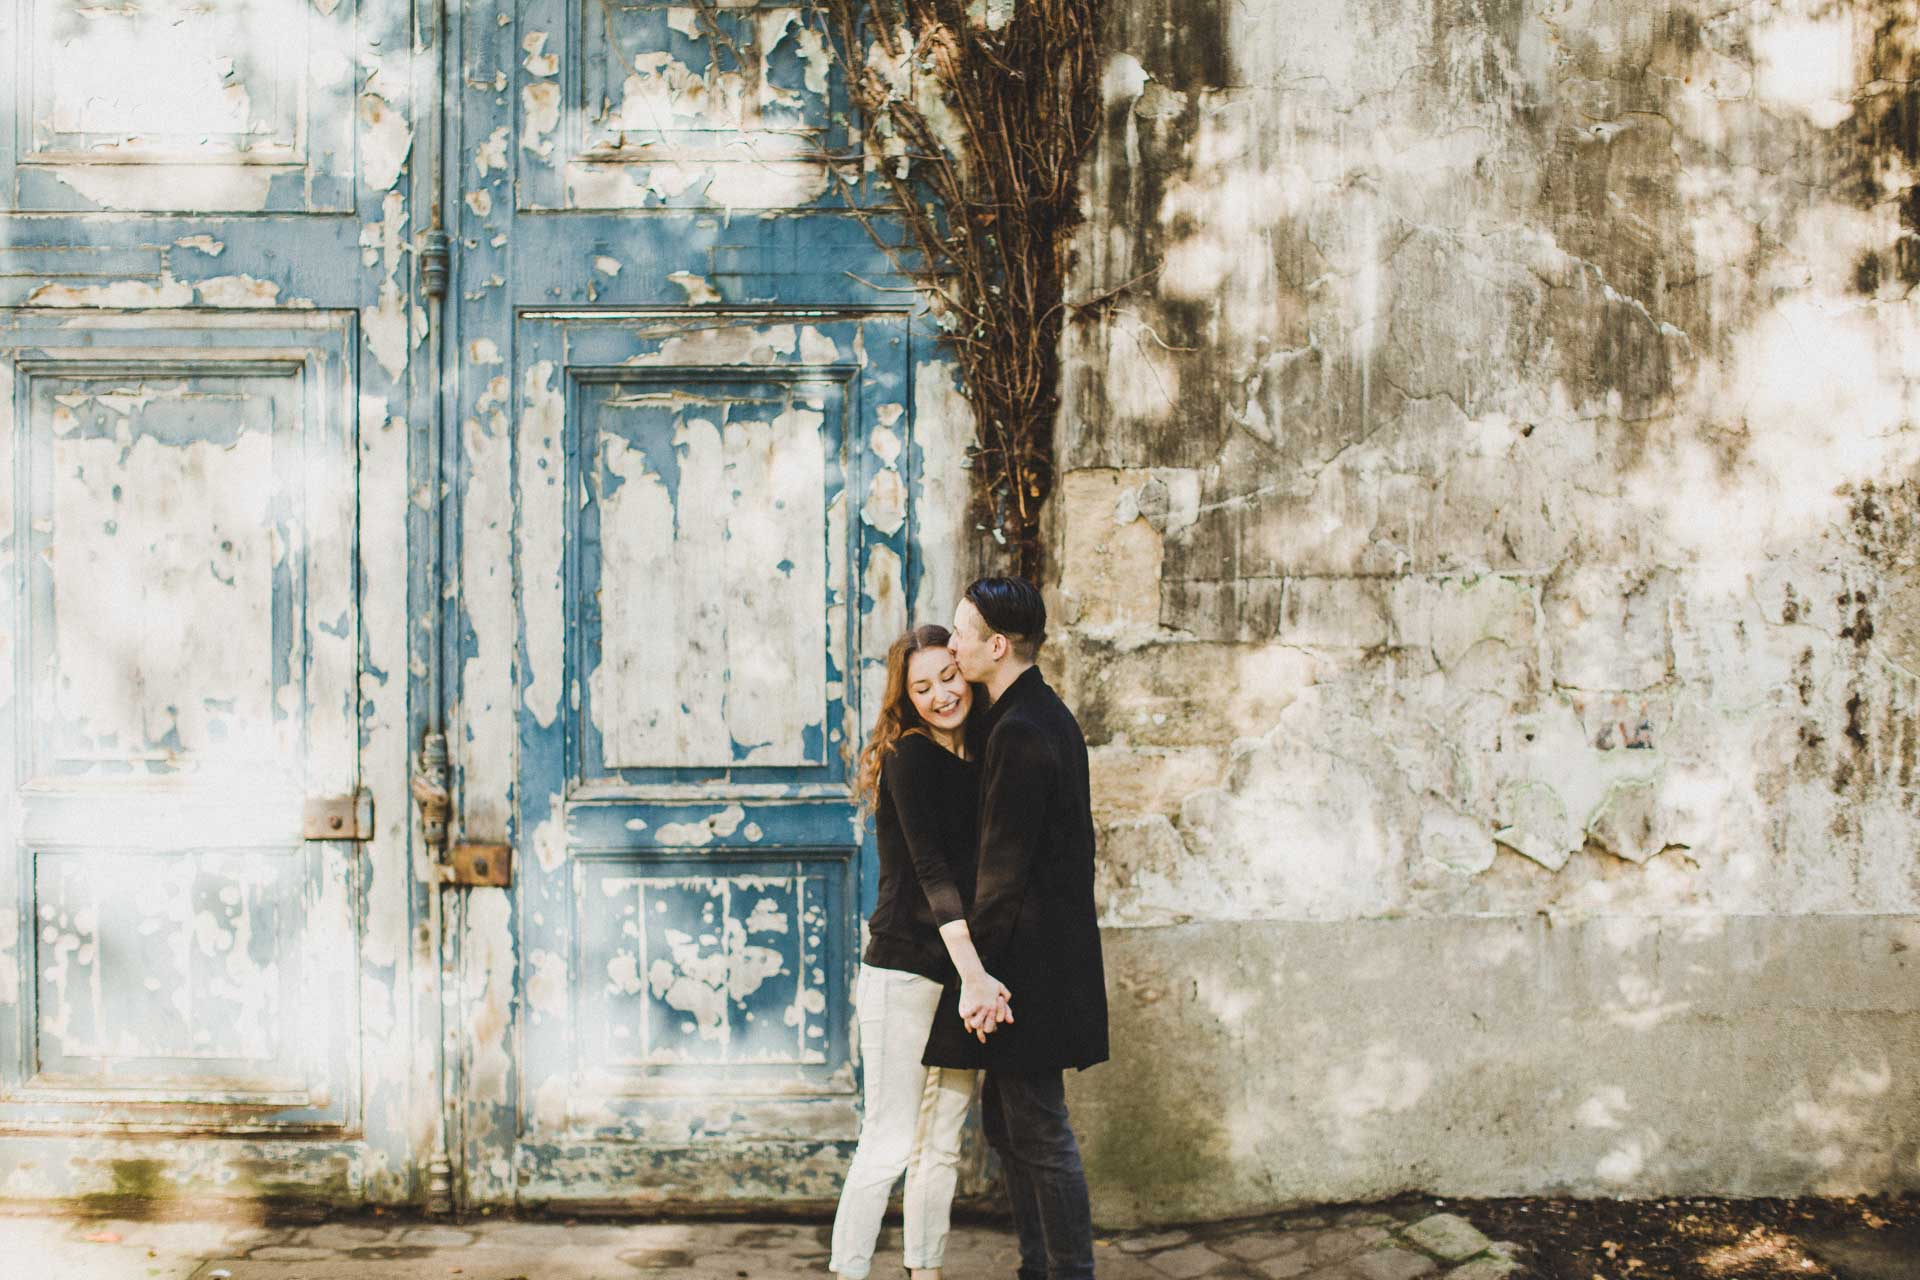 Claire_Johan_Lovesession_Paris_France_JeanLaurentGaudy_023